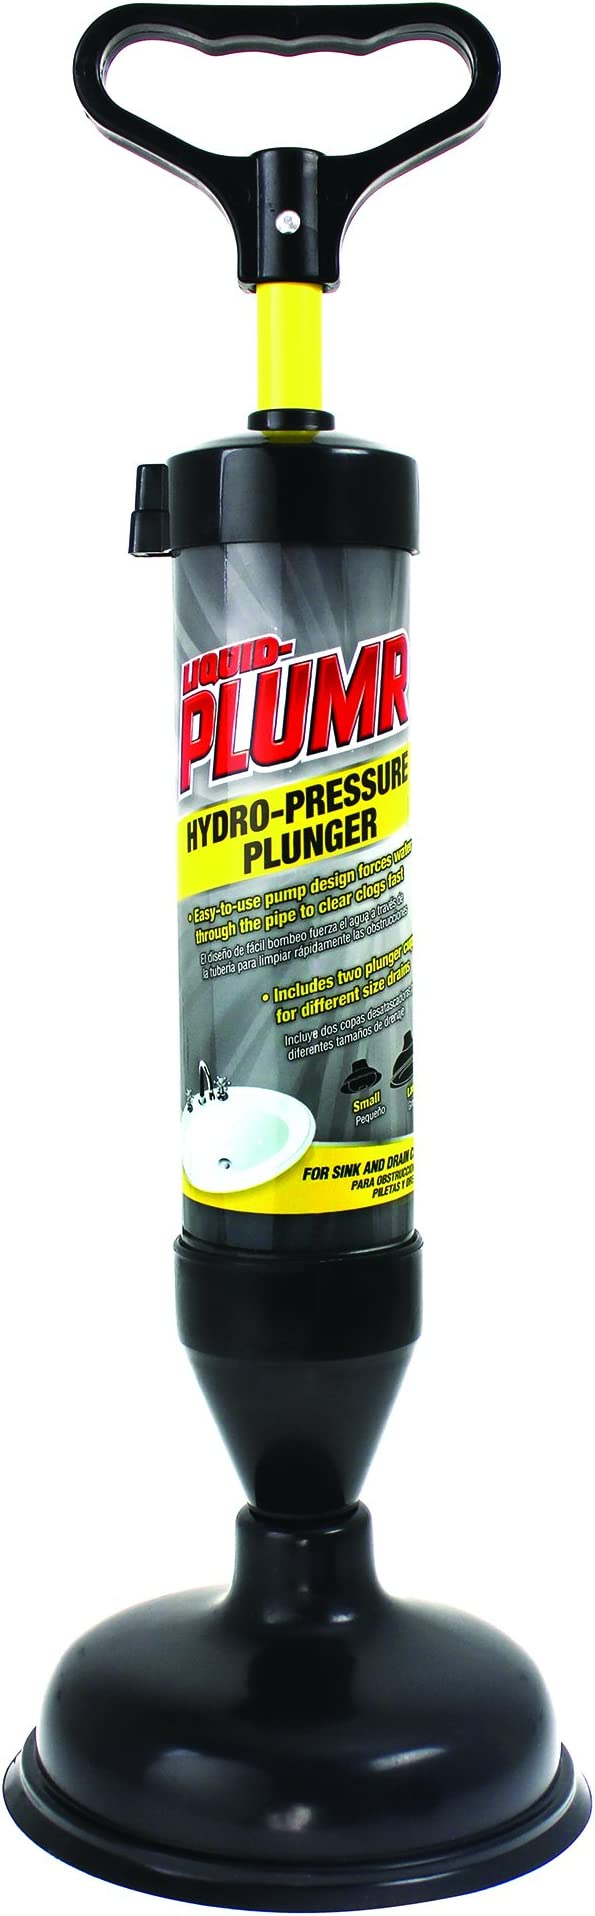 Liquid-Plumr 670087 Hydro-Pressure Plunger, Gray